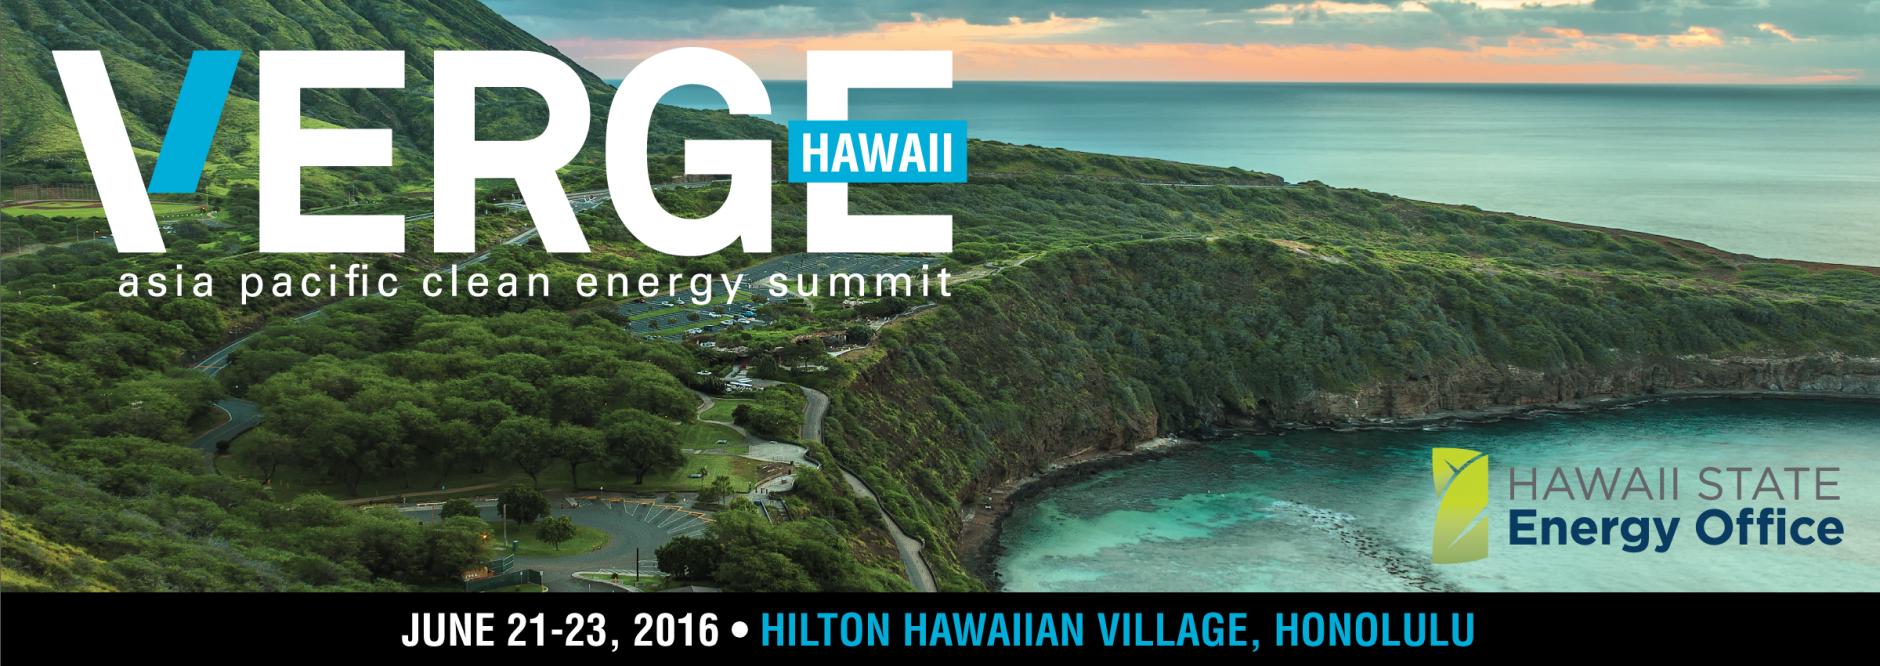 VERGE Hawaii - Asia Pacific Clean Energy Summit